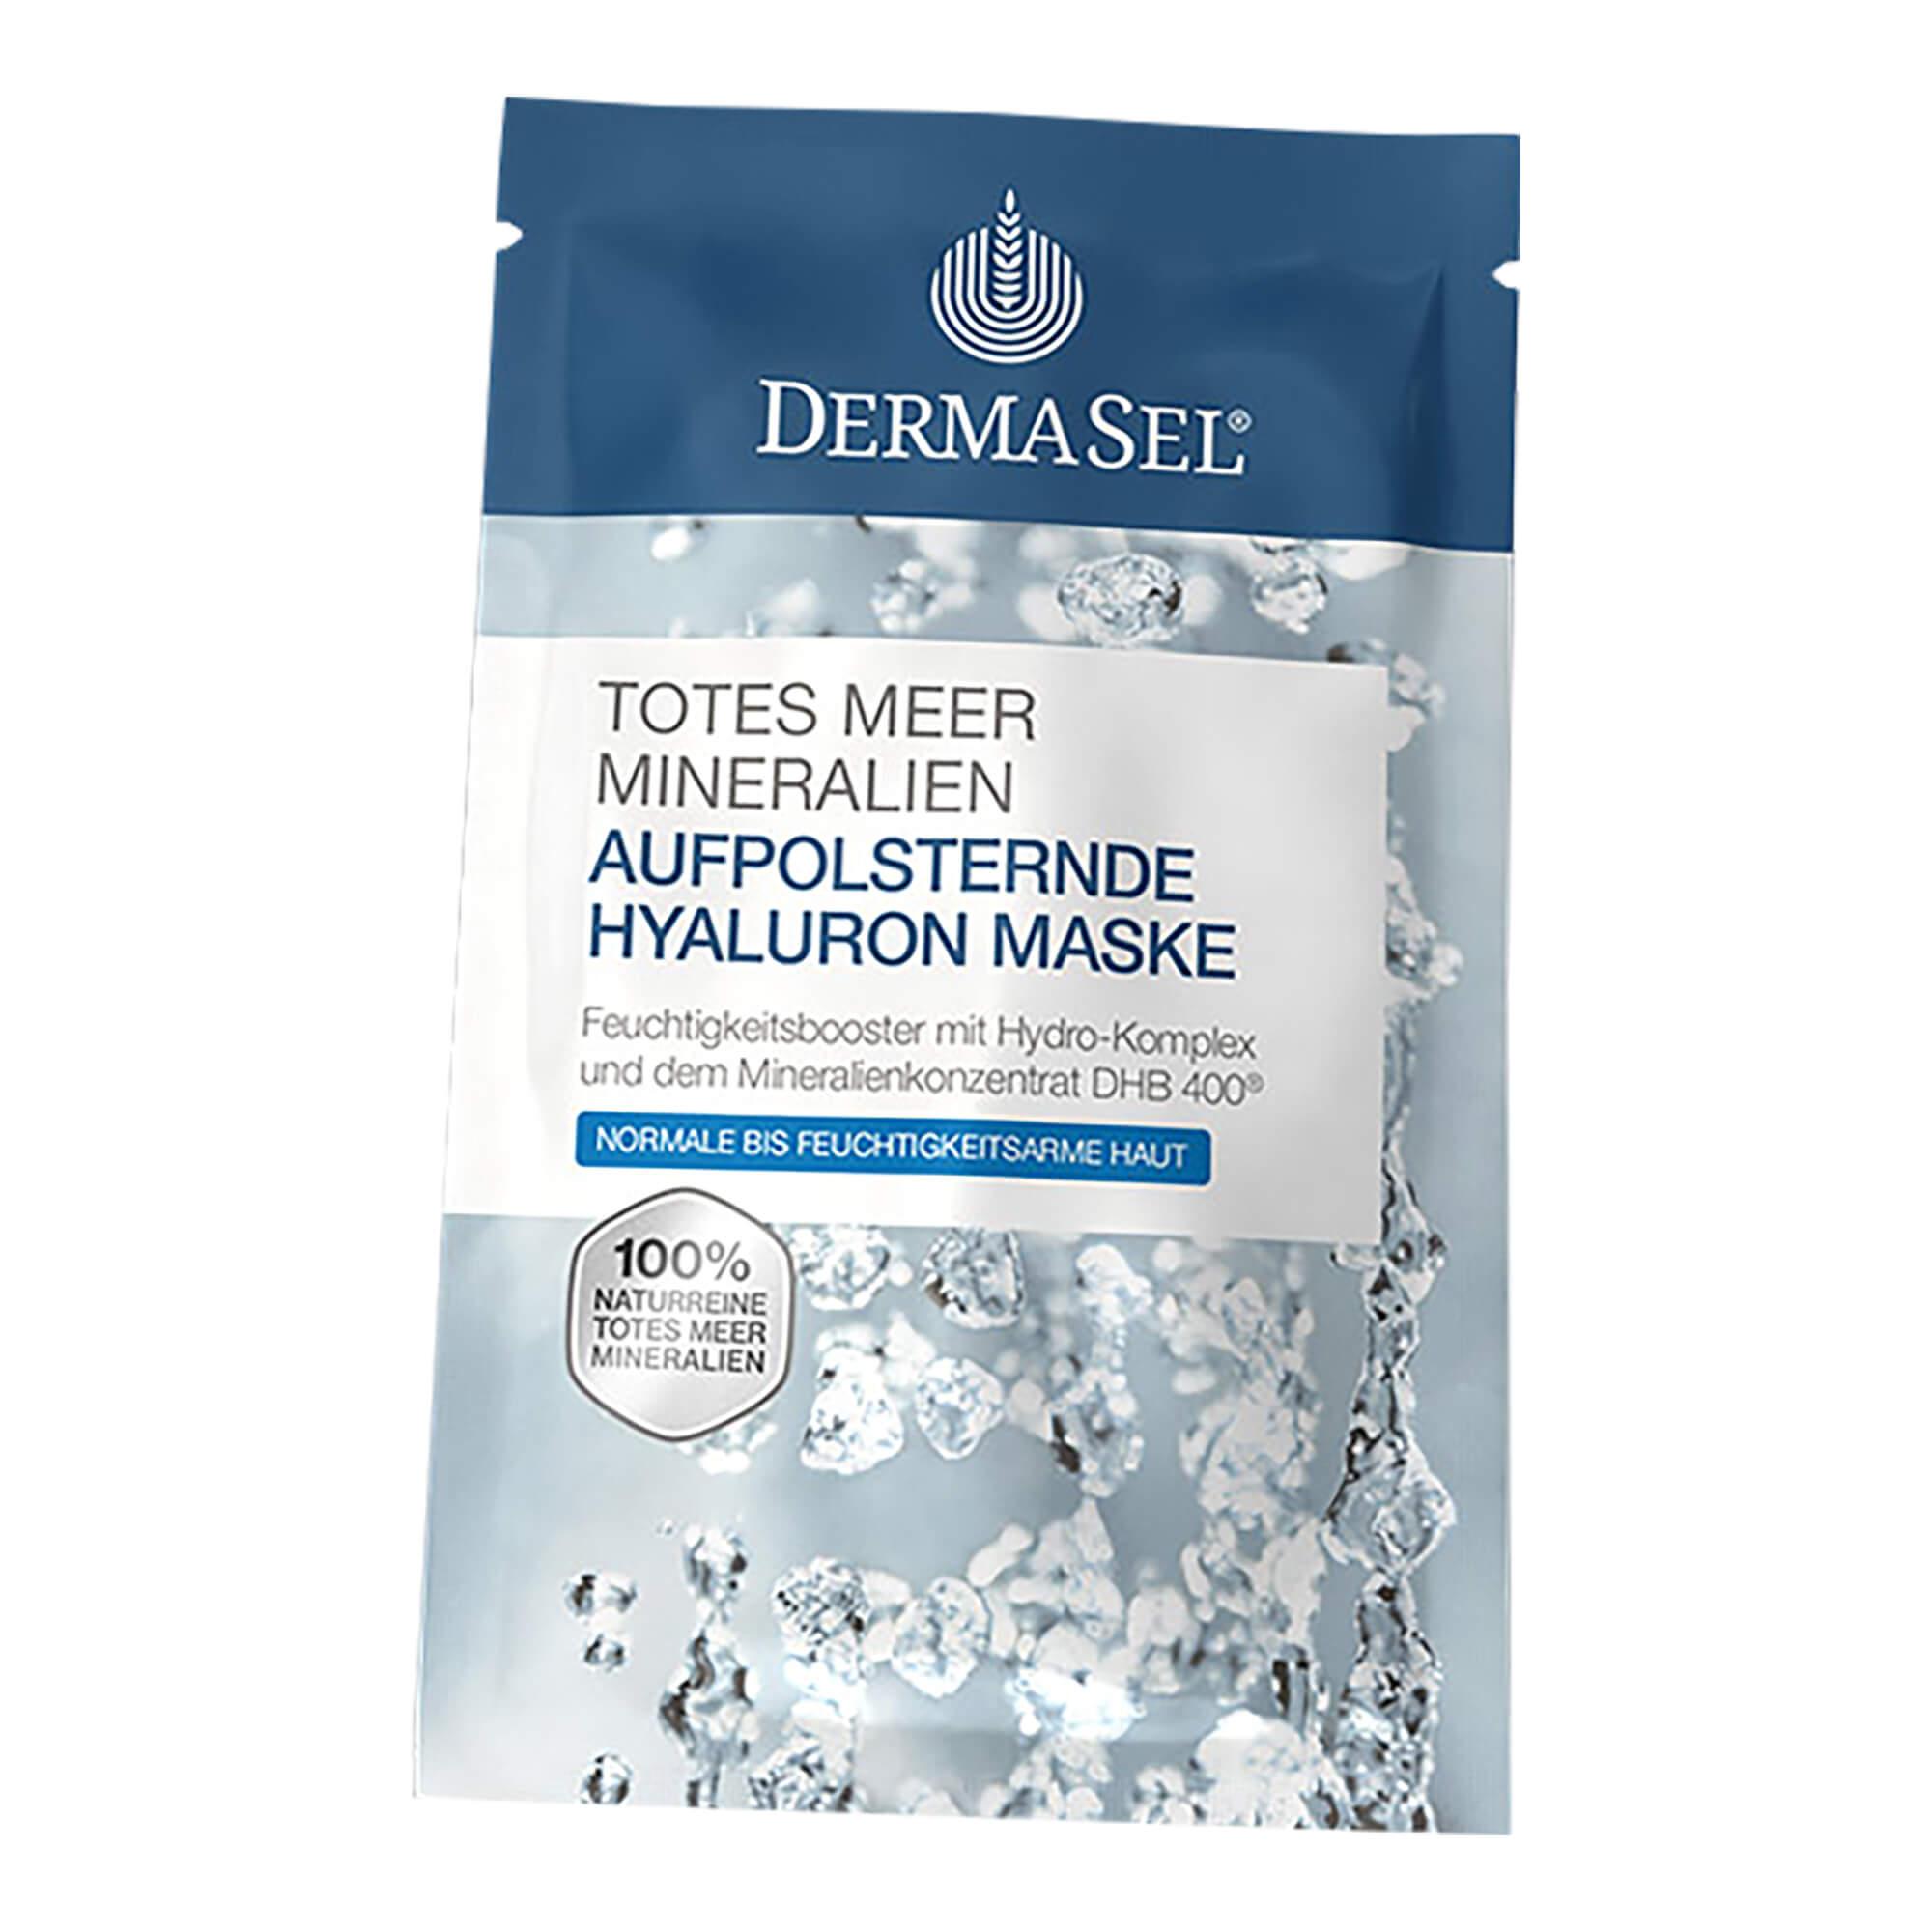 DermaSel Hyaluronmaske